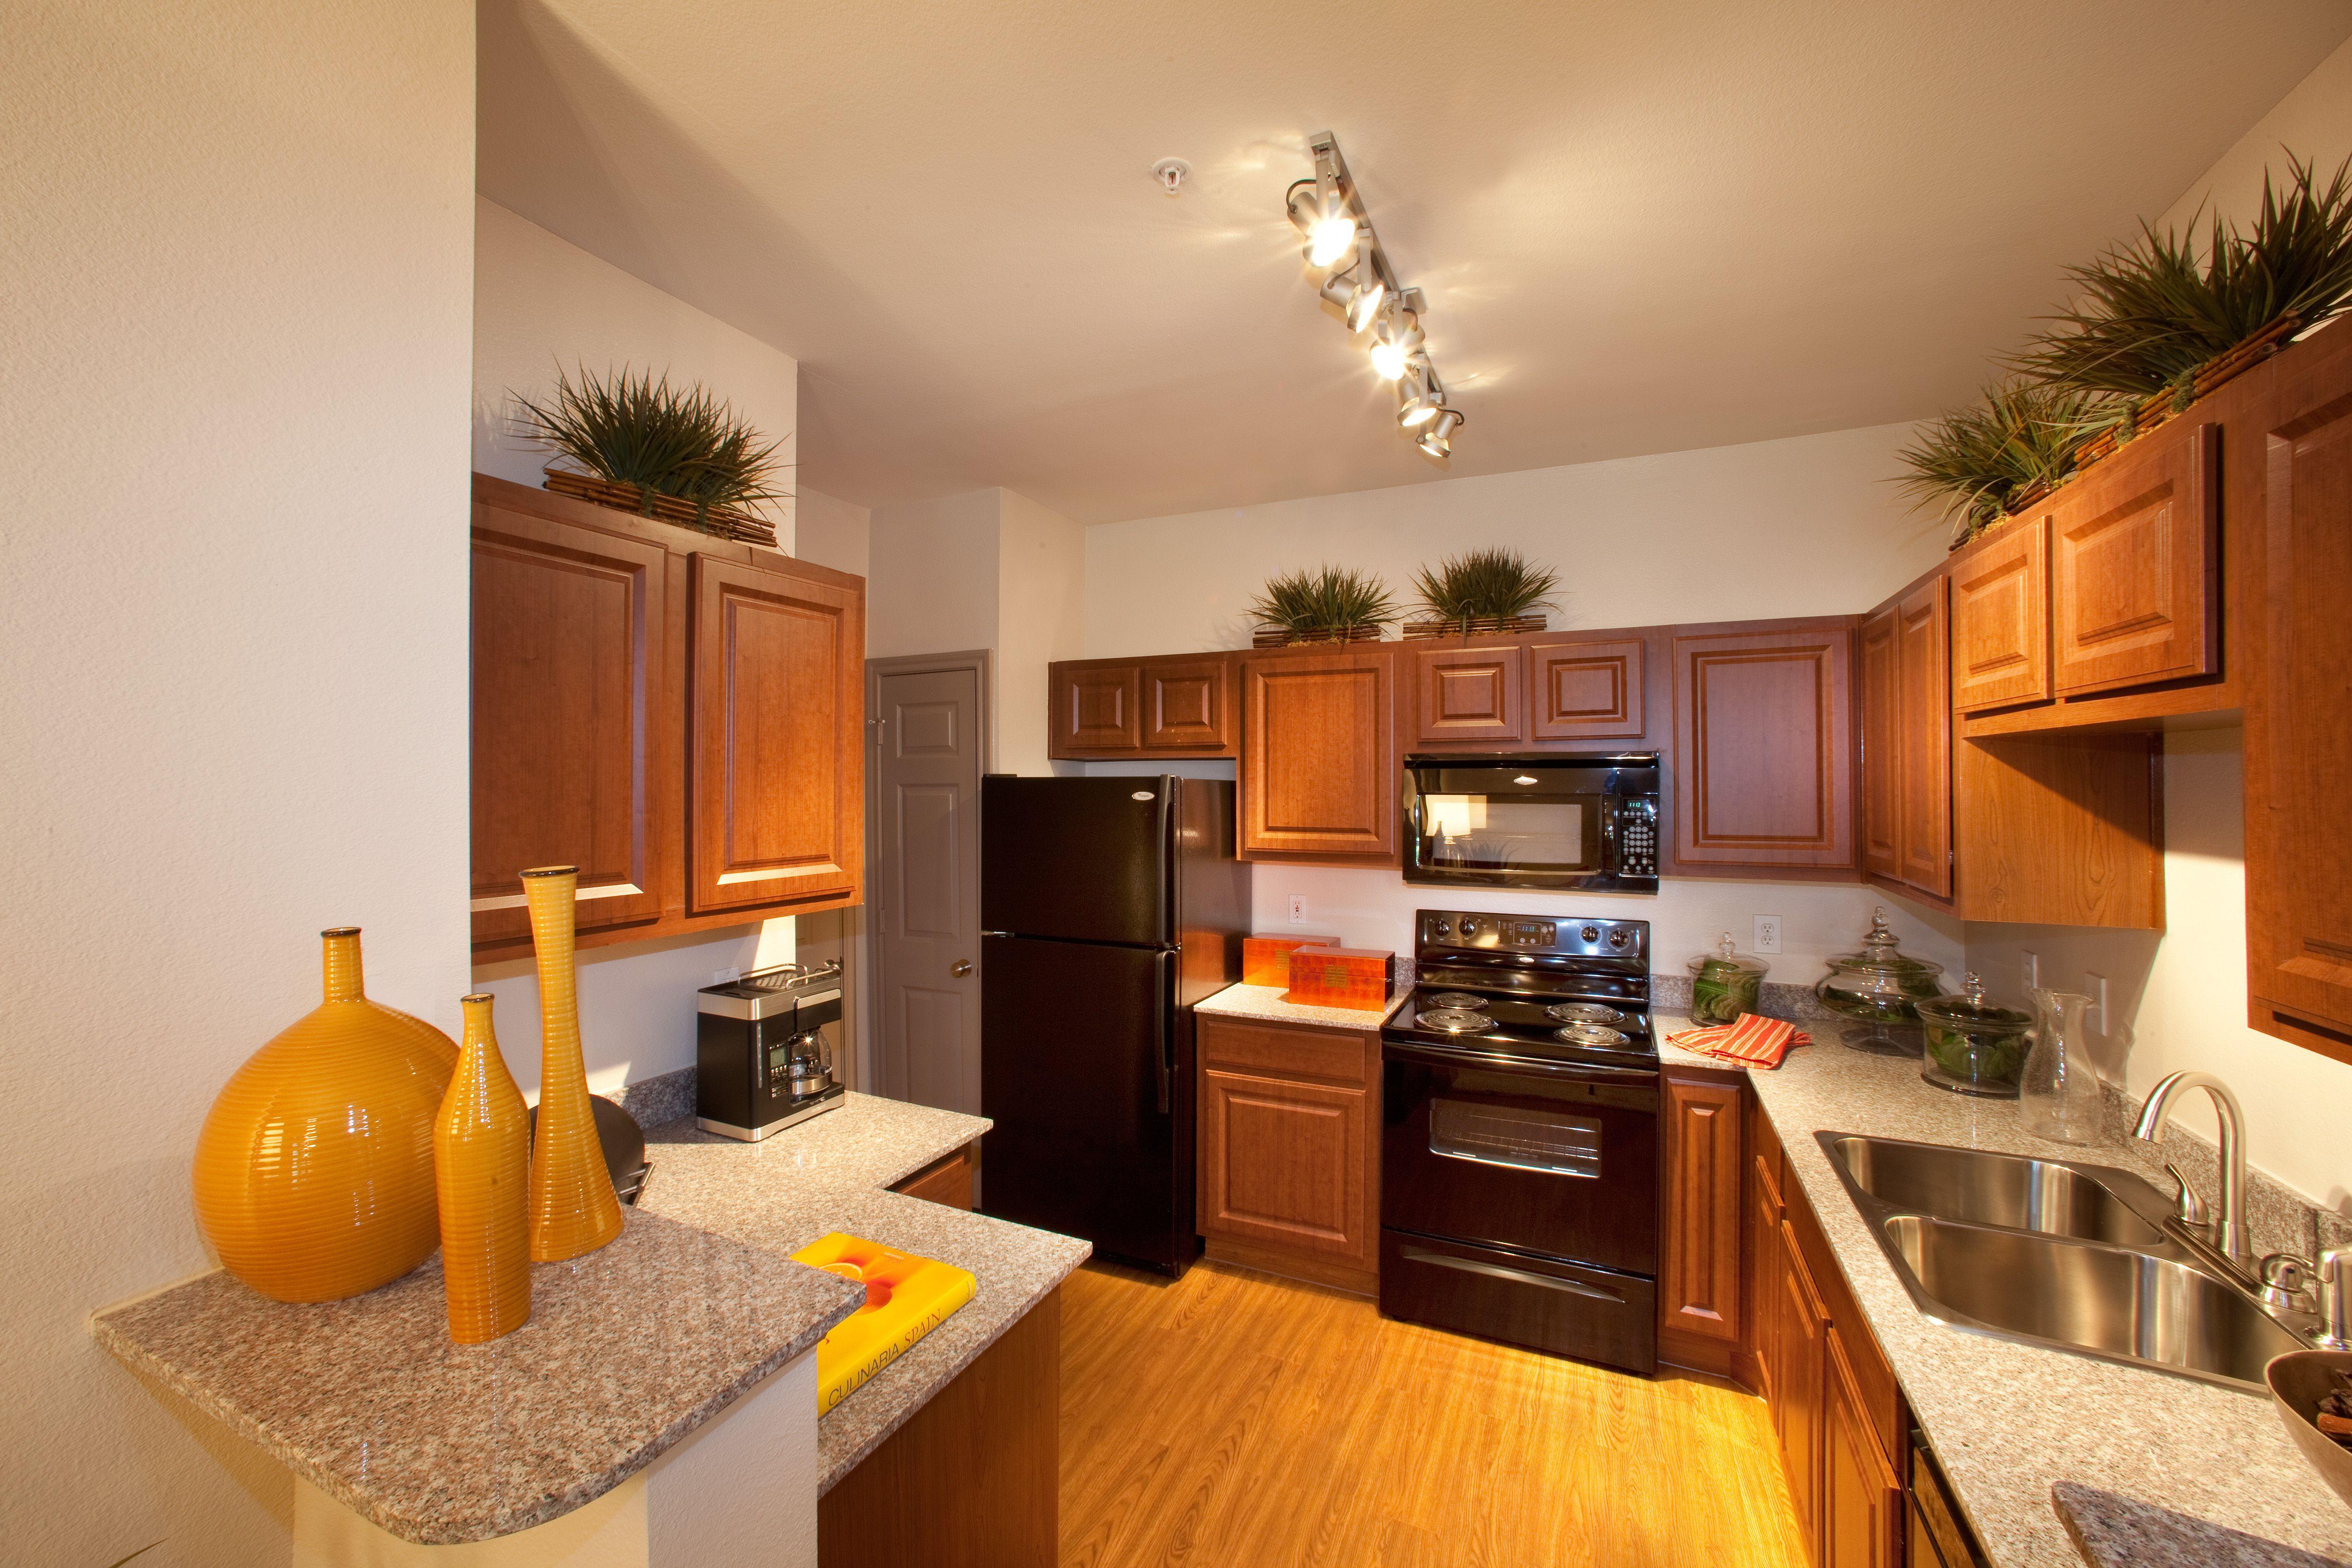 Apartment Decoration Ideas In Houston Tx Apartment Decor Home Decor